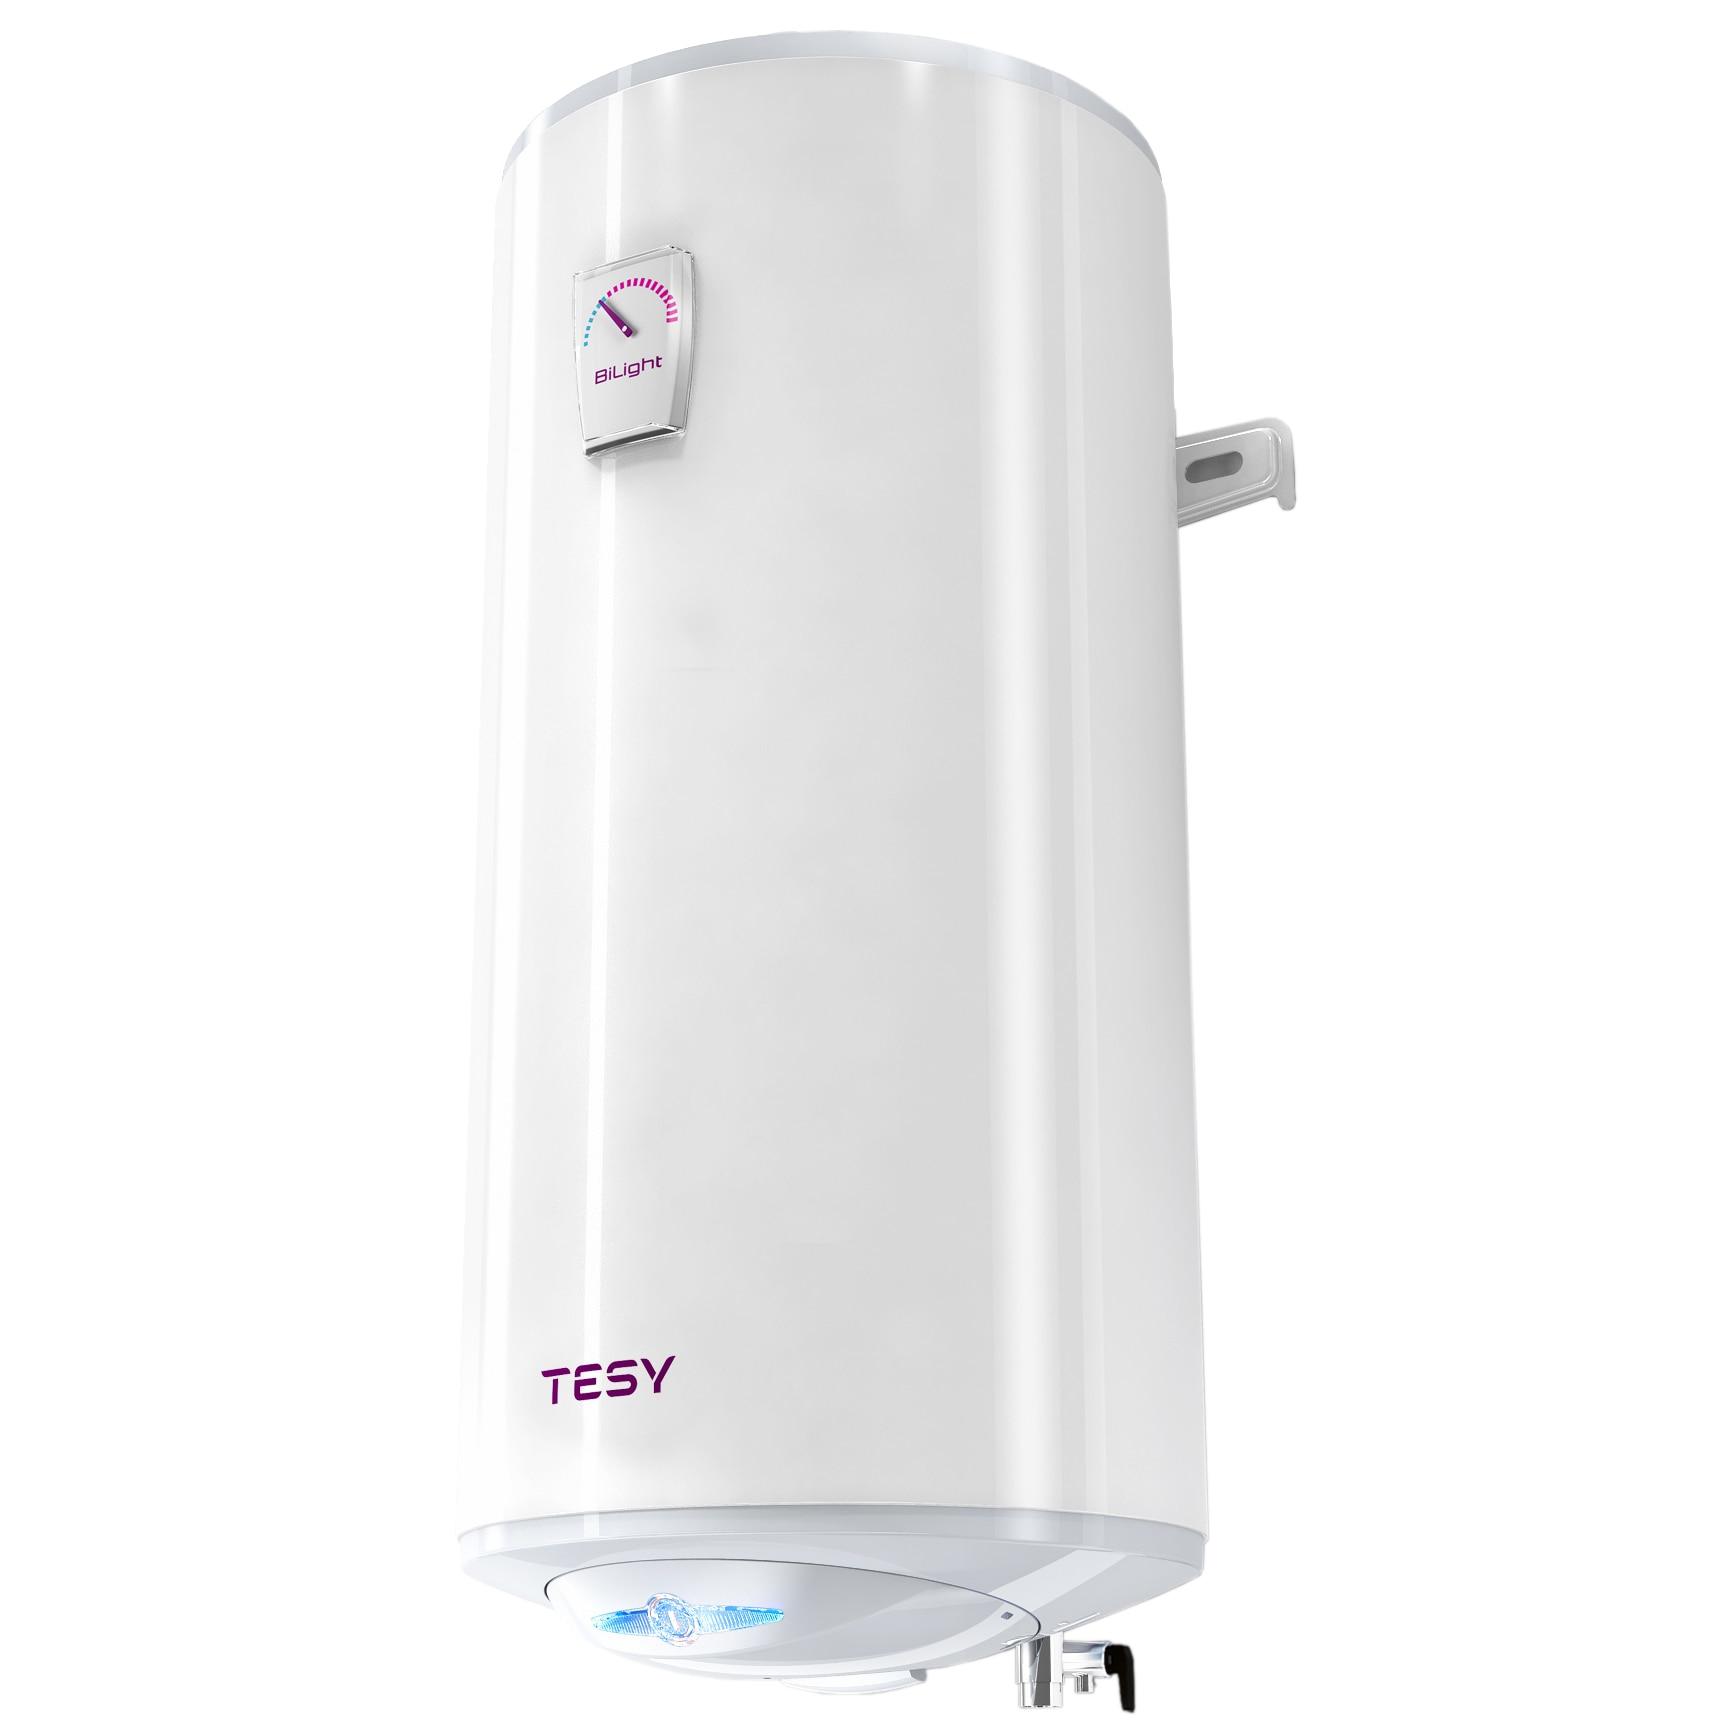 Fotografie Boiler electric Tesy BiLight SLIM GCV503820B11TSR, 2000 W, 50 L, 0.8 Mpa, 34 mm, Protectie anti-inghet